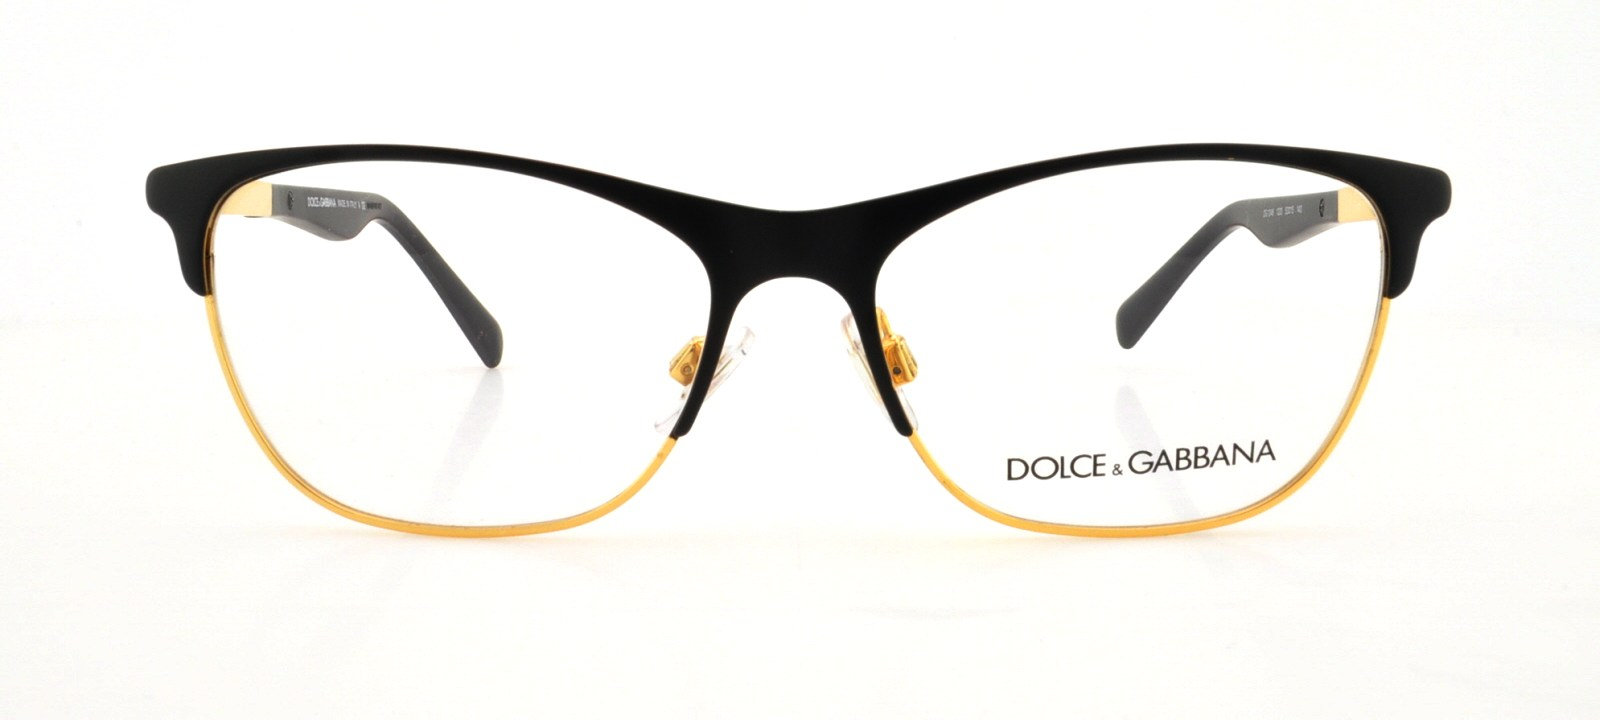 bbcc361b1d5 DOLCE   GABBANA Eyeglasses DG 1246 1220 Matte Black Gold 53MM - Walmart.com